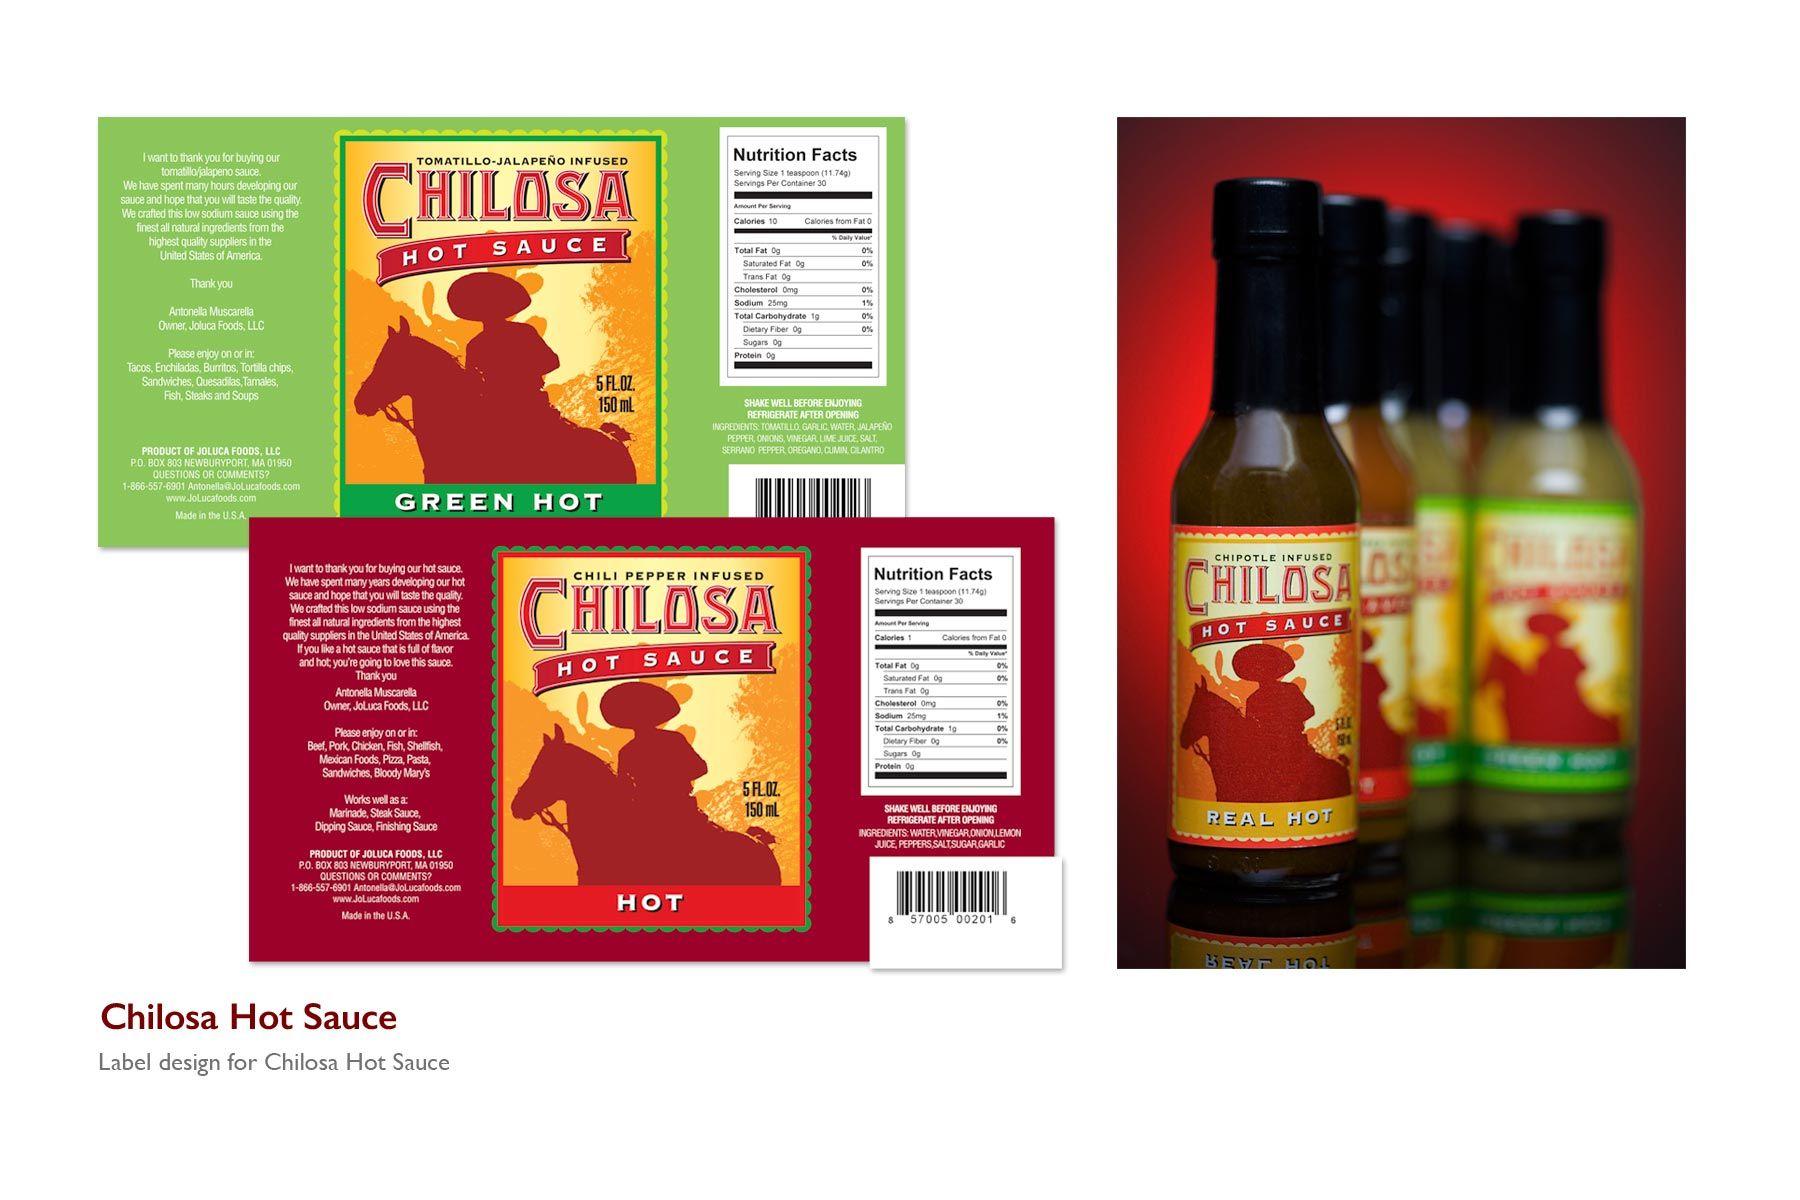 Chilosa Hot Sauce Label